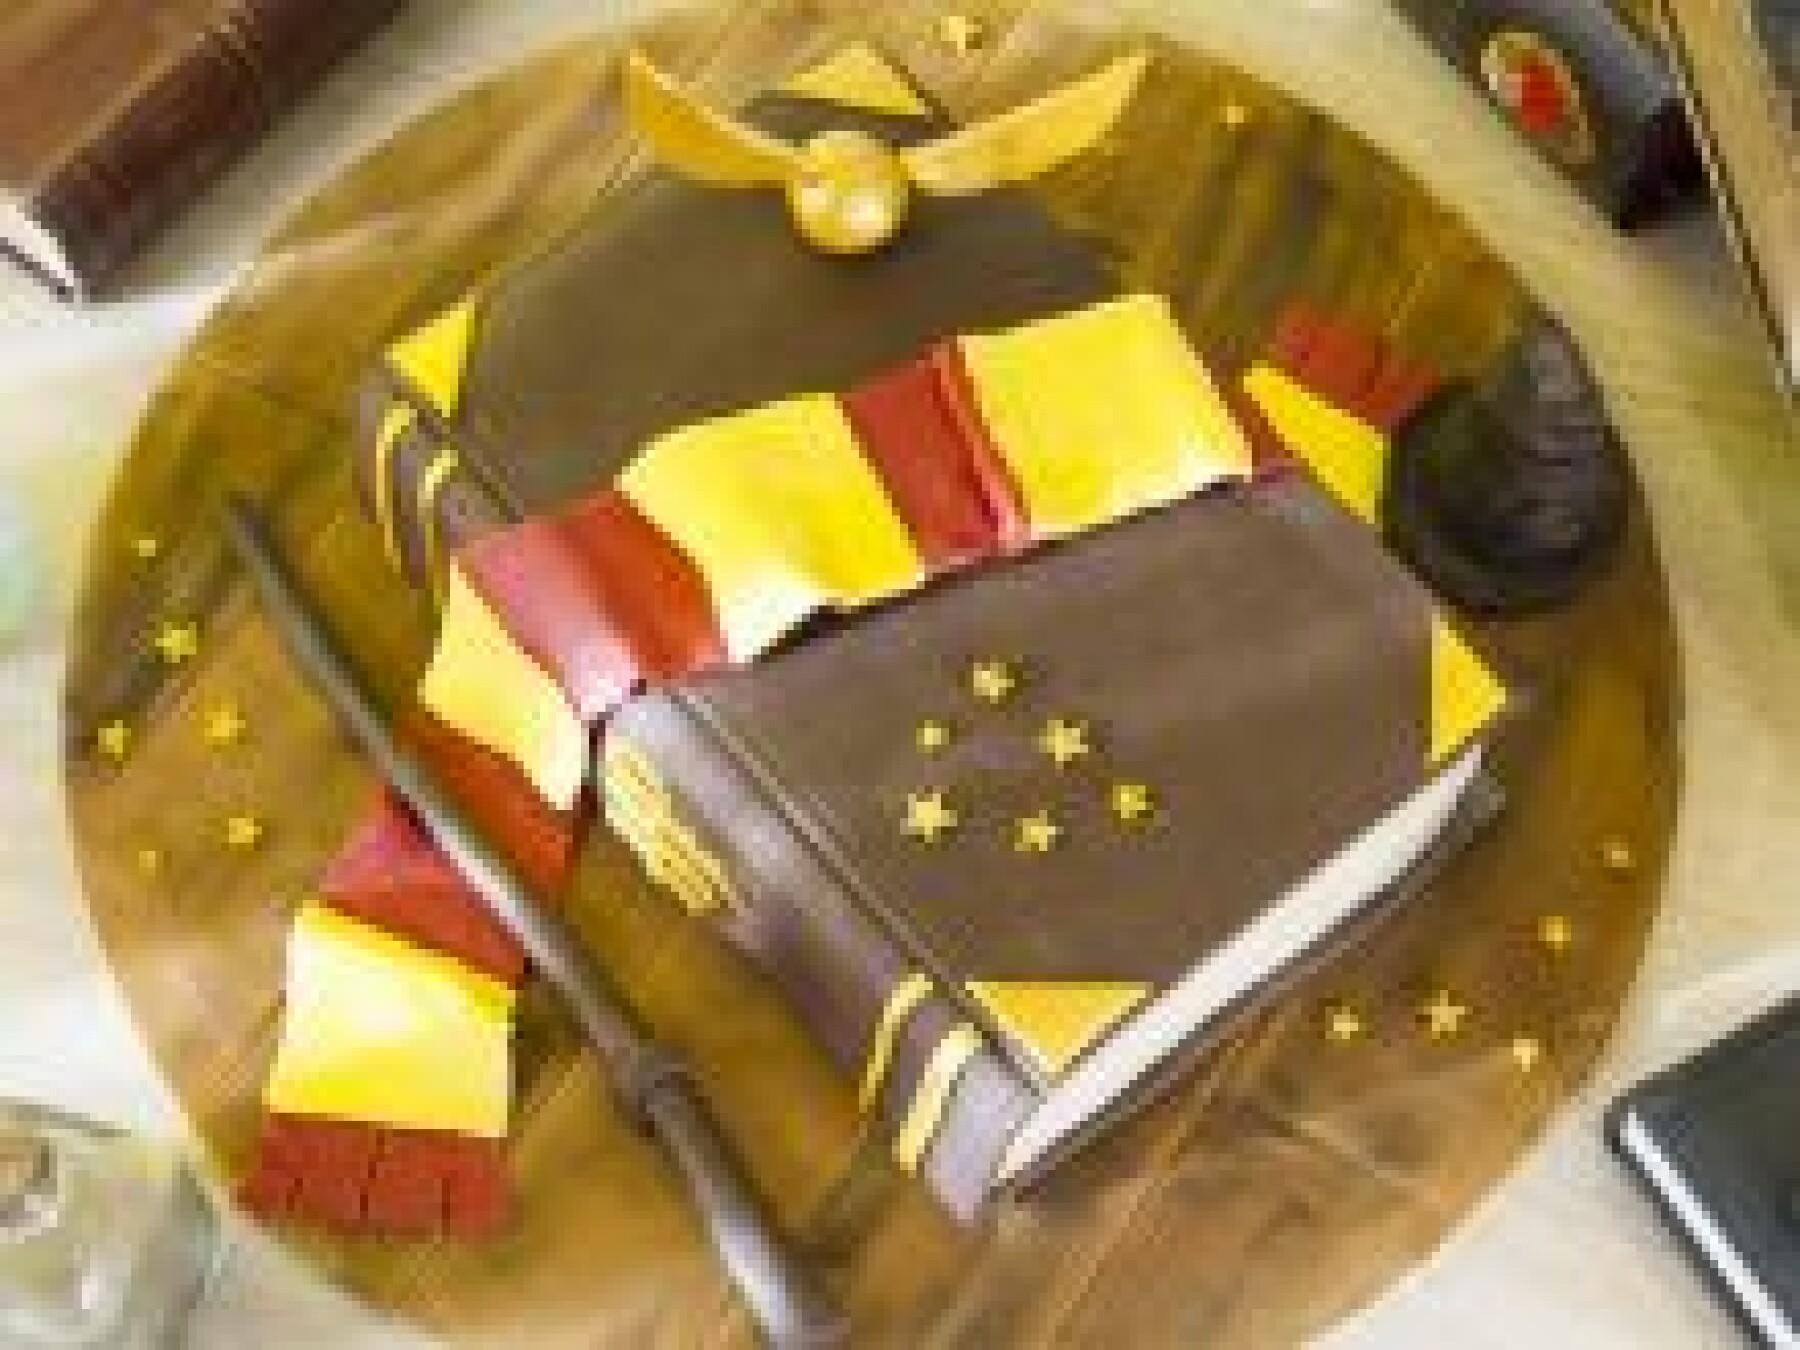 Le gâteau Harry Potter